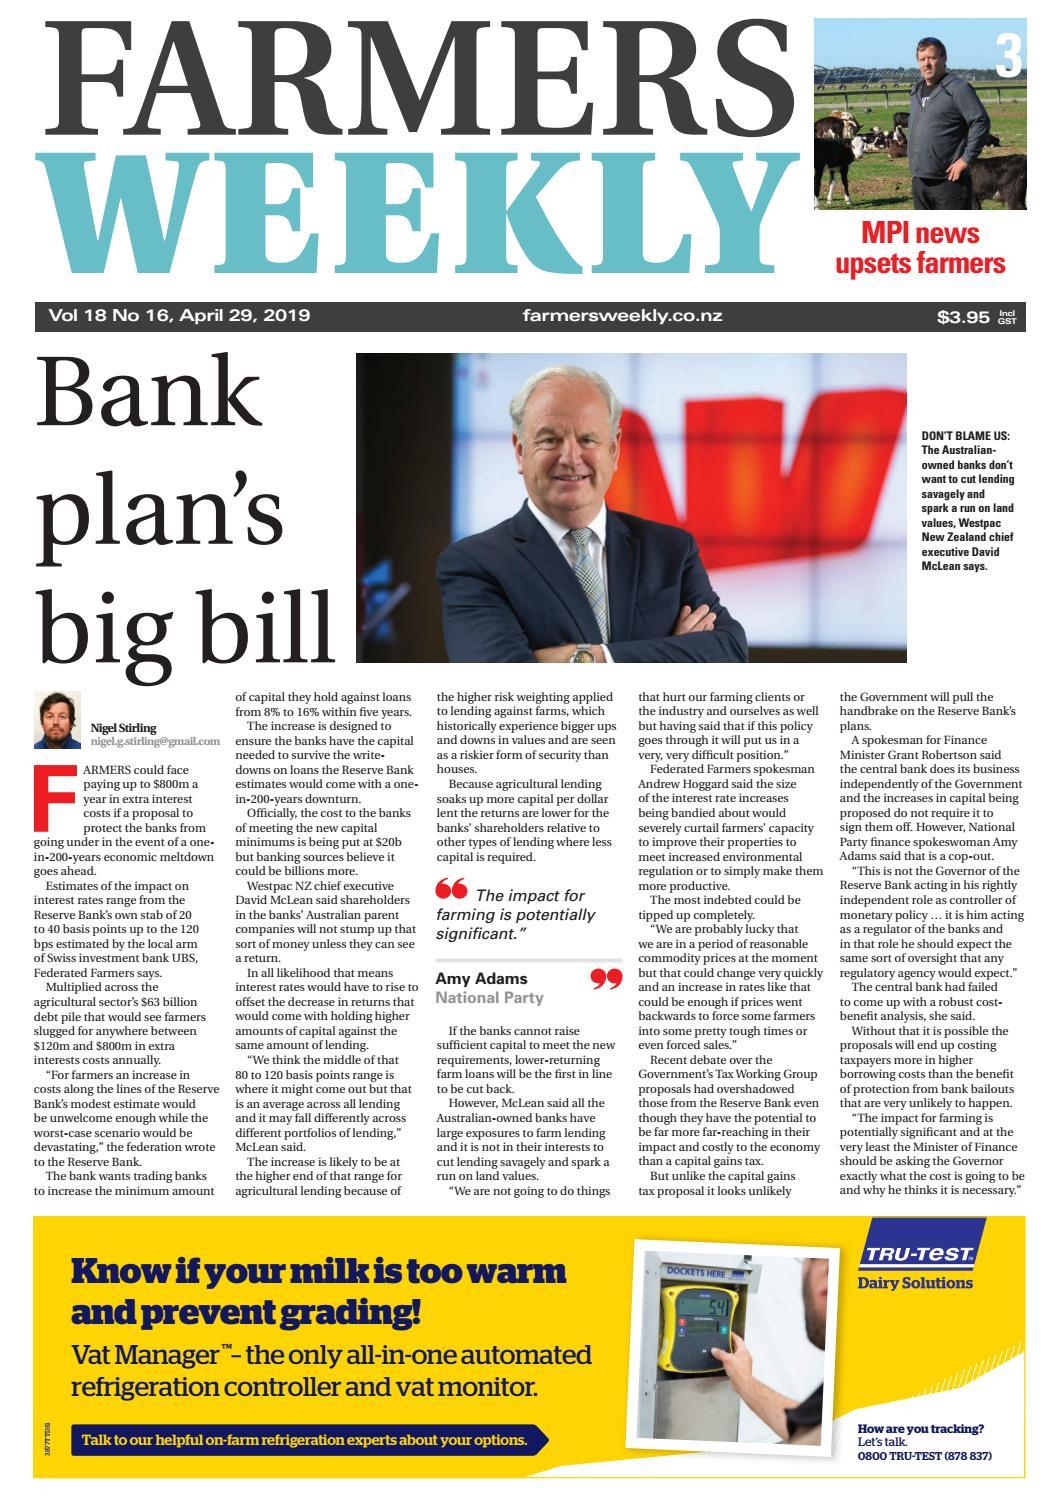 ac96d0bf0a3 Farmers Weekly NZ April 29 2019 by Farmers Weekly NZ - issuu